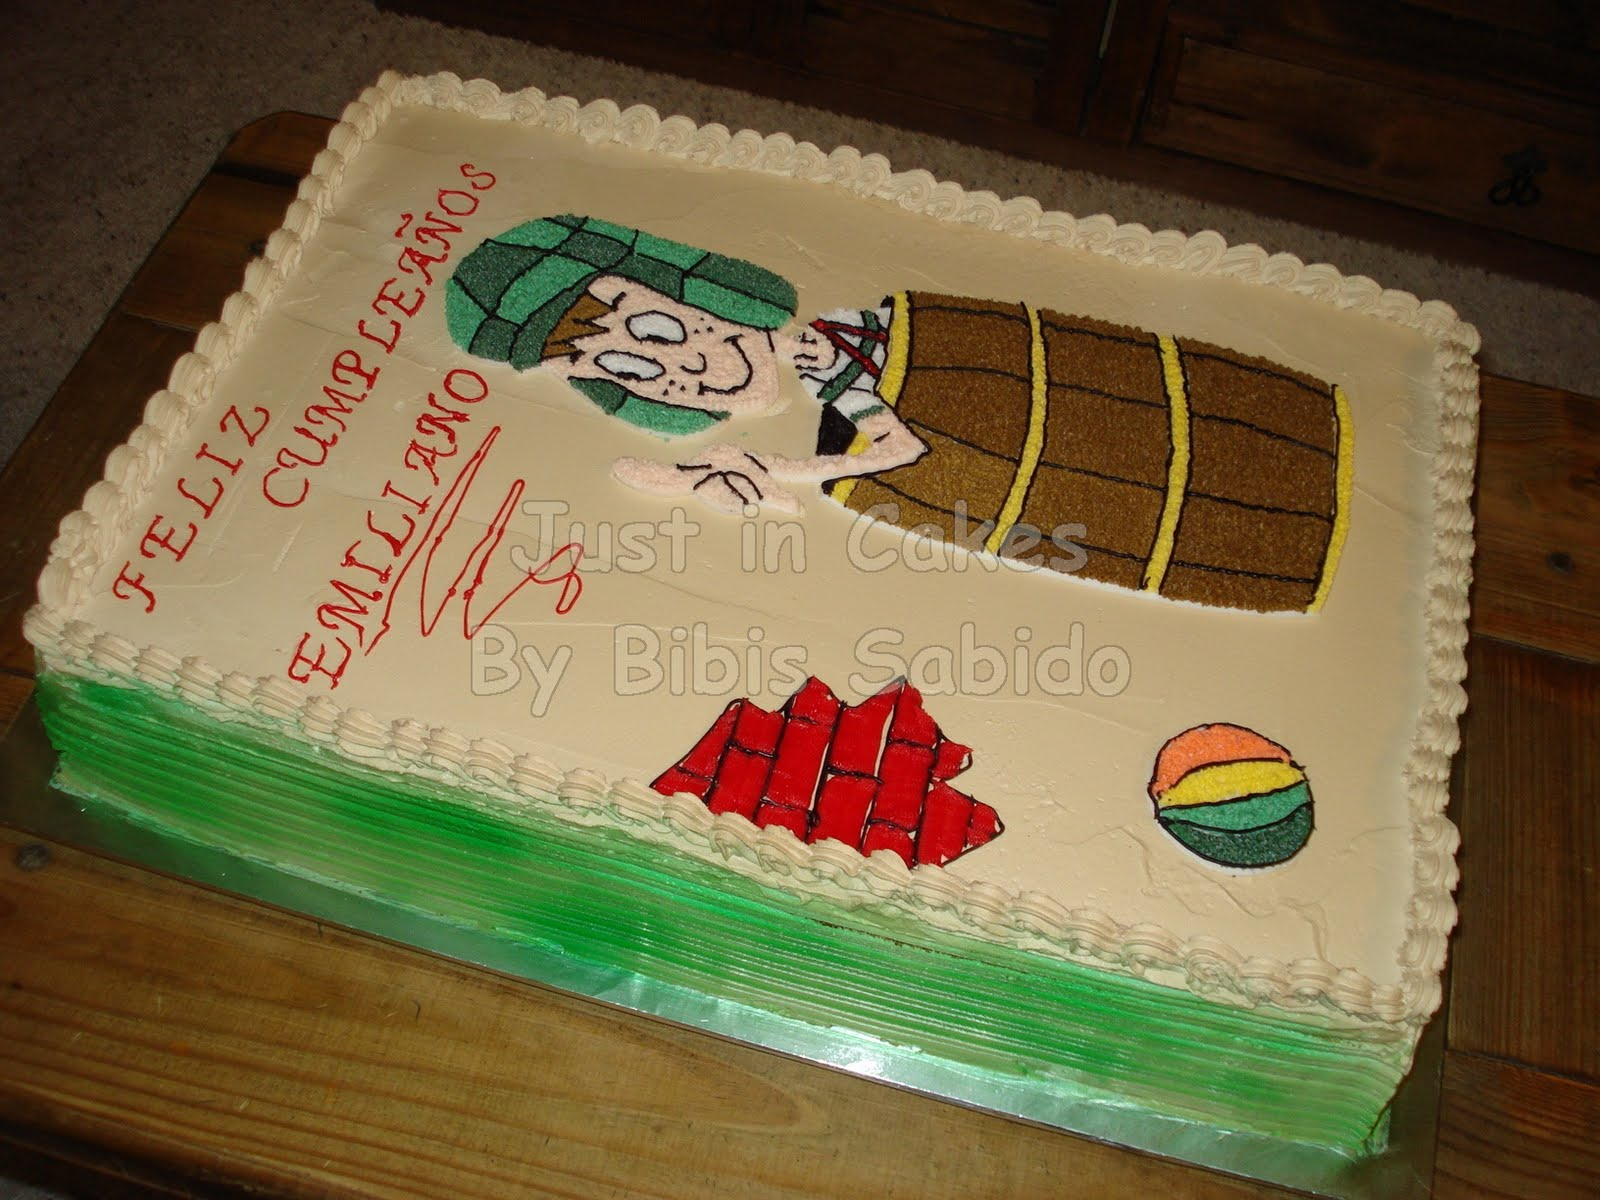 El Chavo del 8 Cake | Just in Cakes